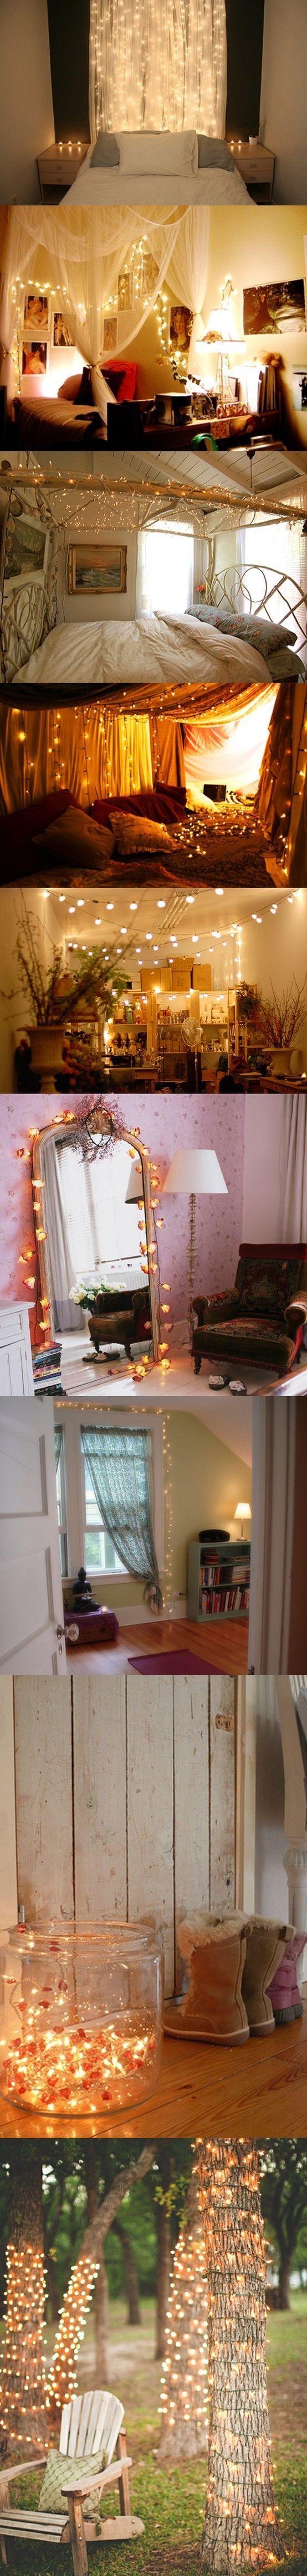 decorative lights 15                                                                                                                                                                                 More